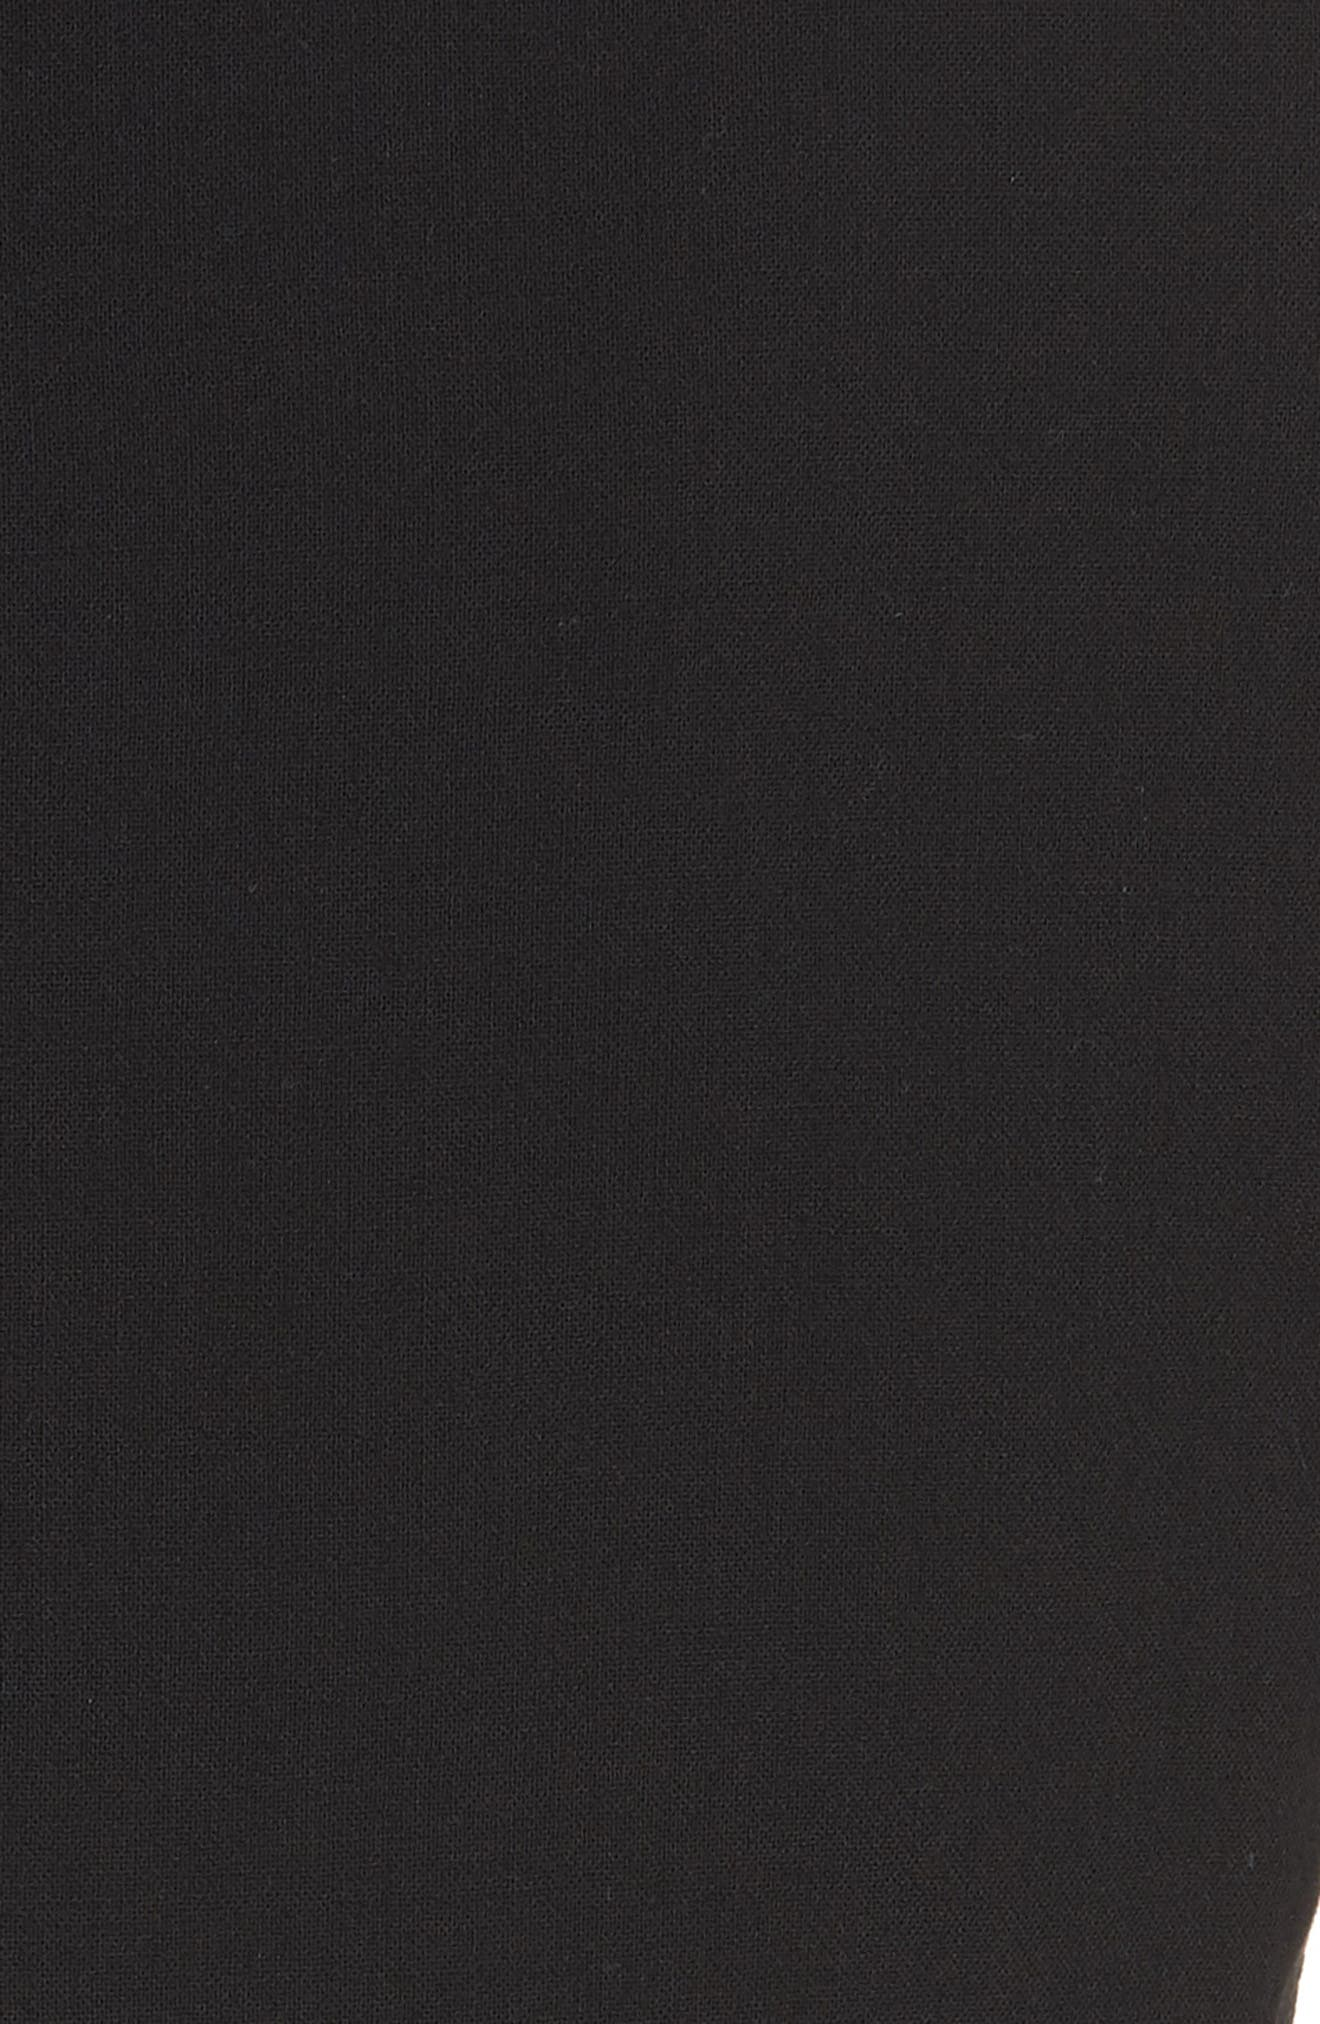 Ilke Double Face Wool Blend Jacket,                             Alternate thumbnail 8, color,                             BLACK